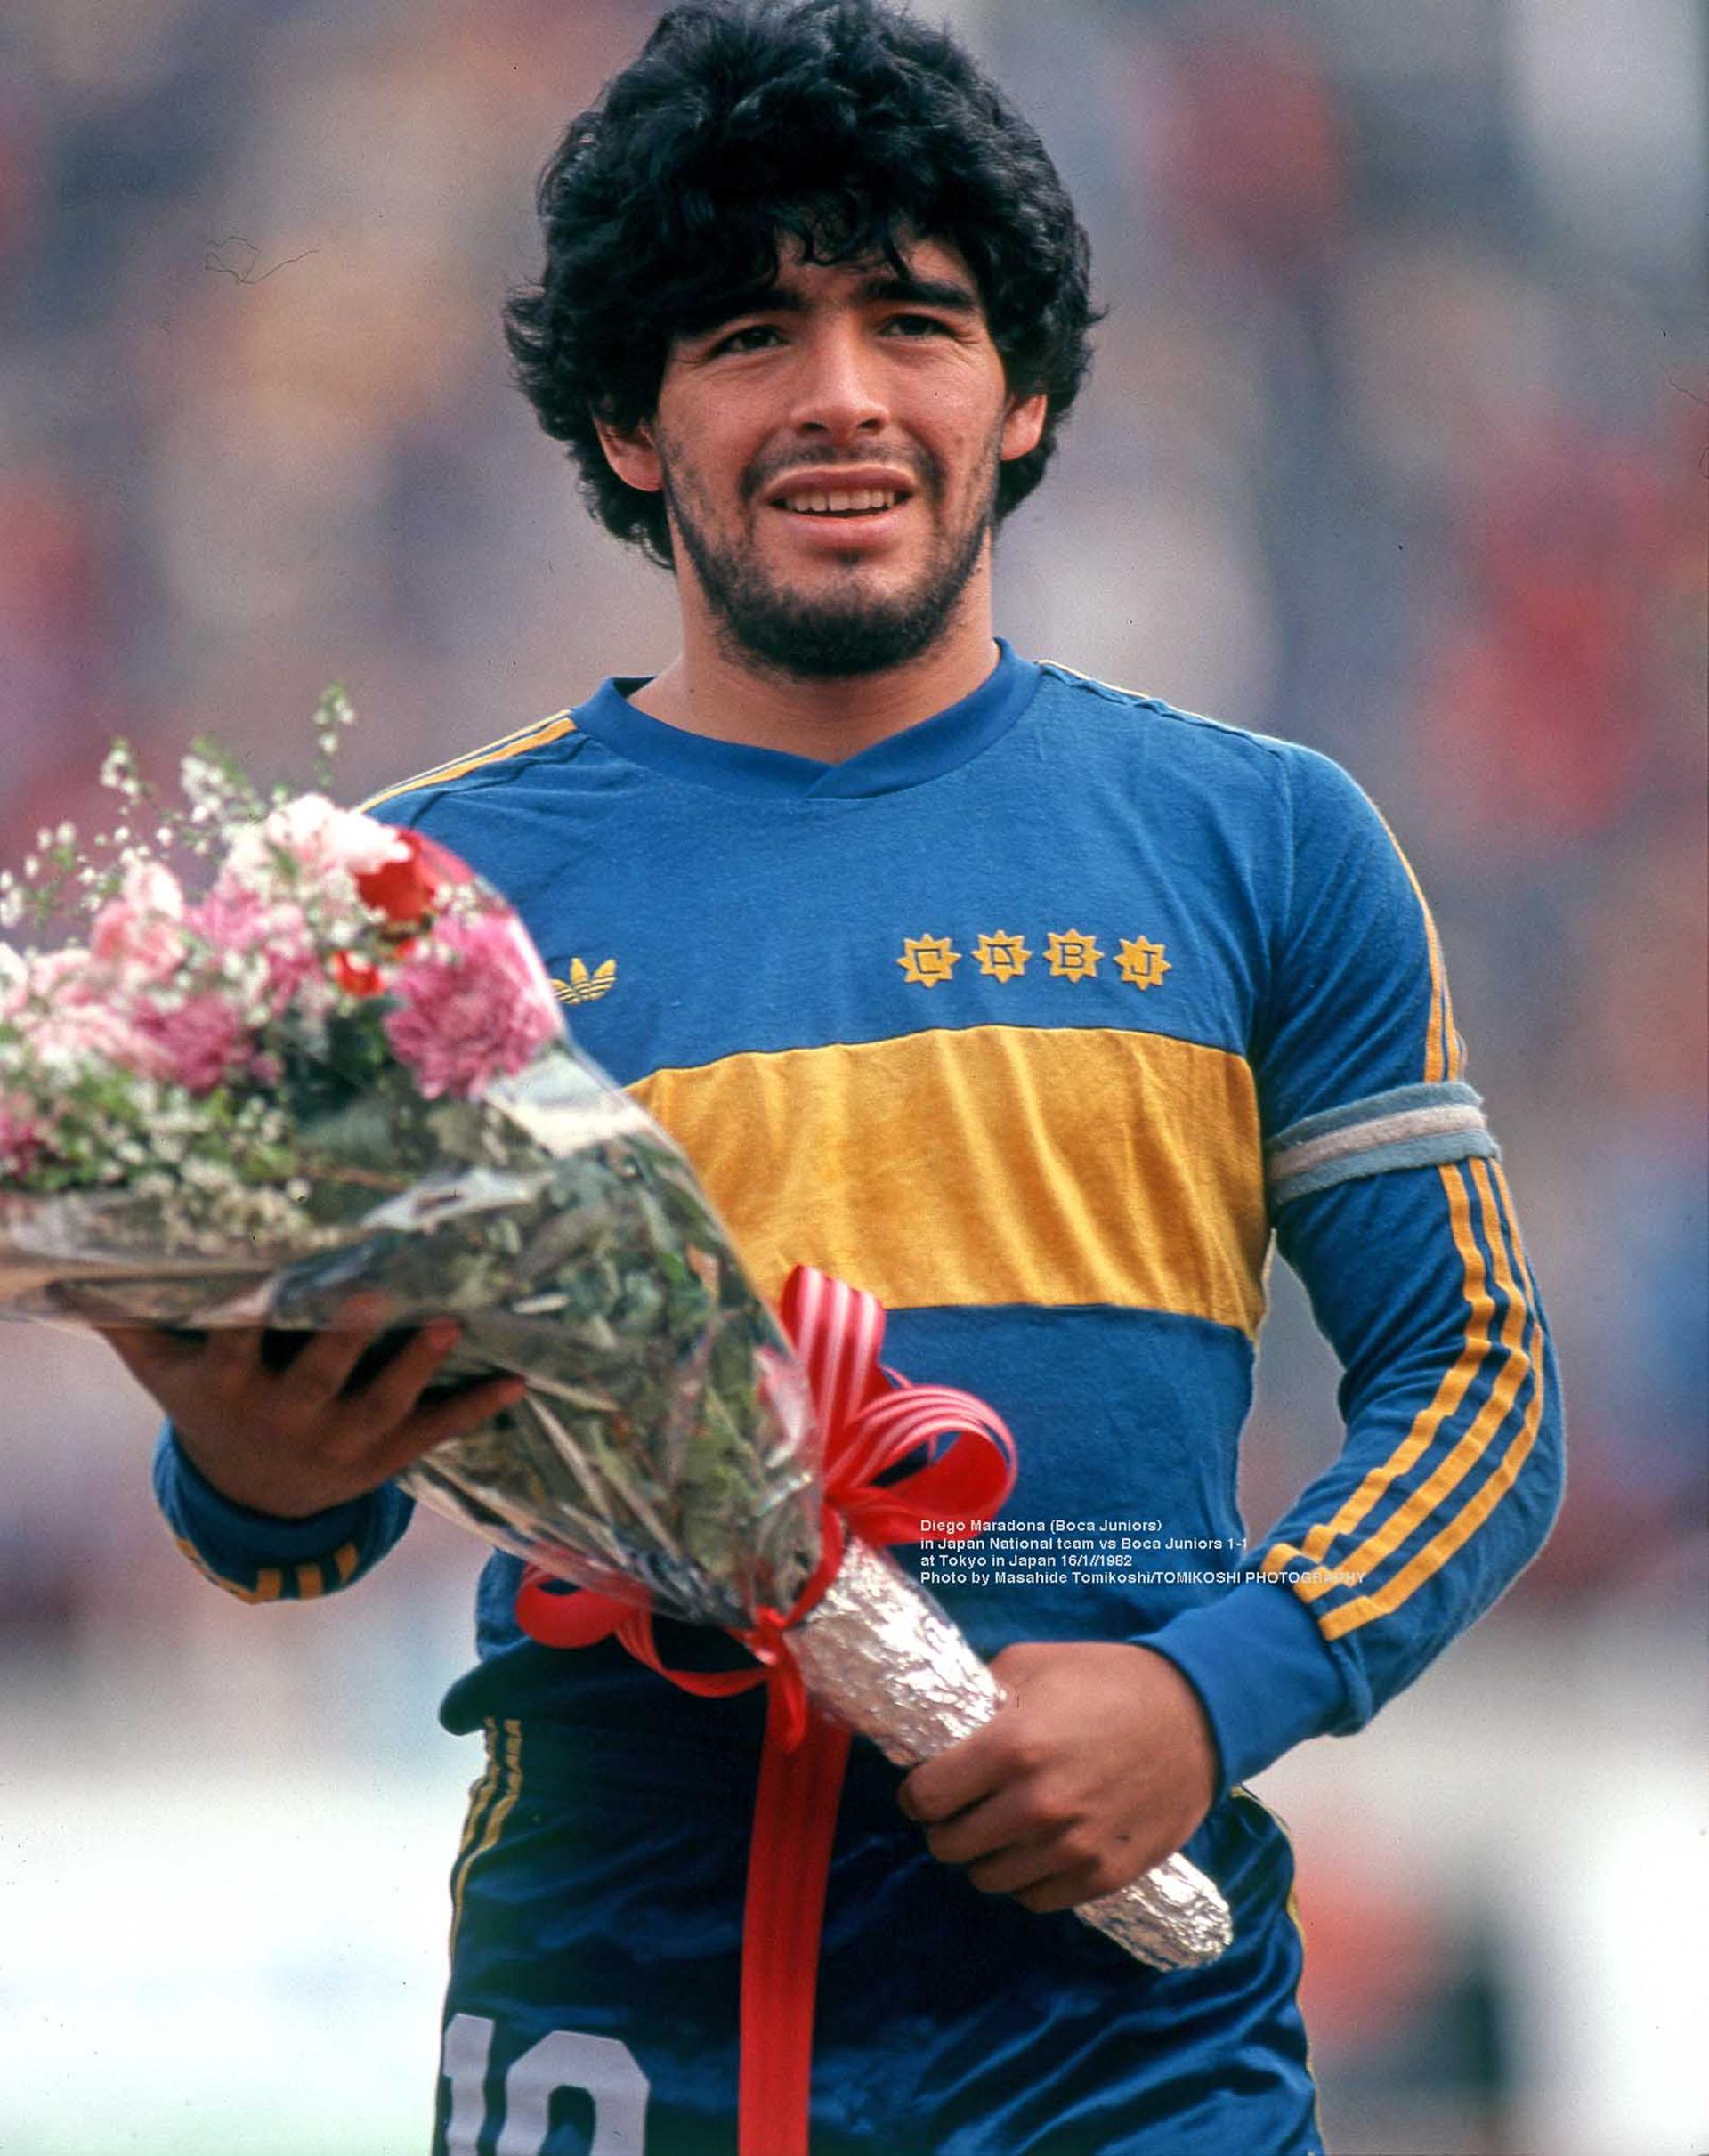 00-Maradona-Boca-1982-gira-Japon-SF-16.jpg